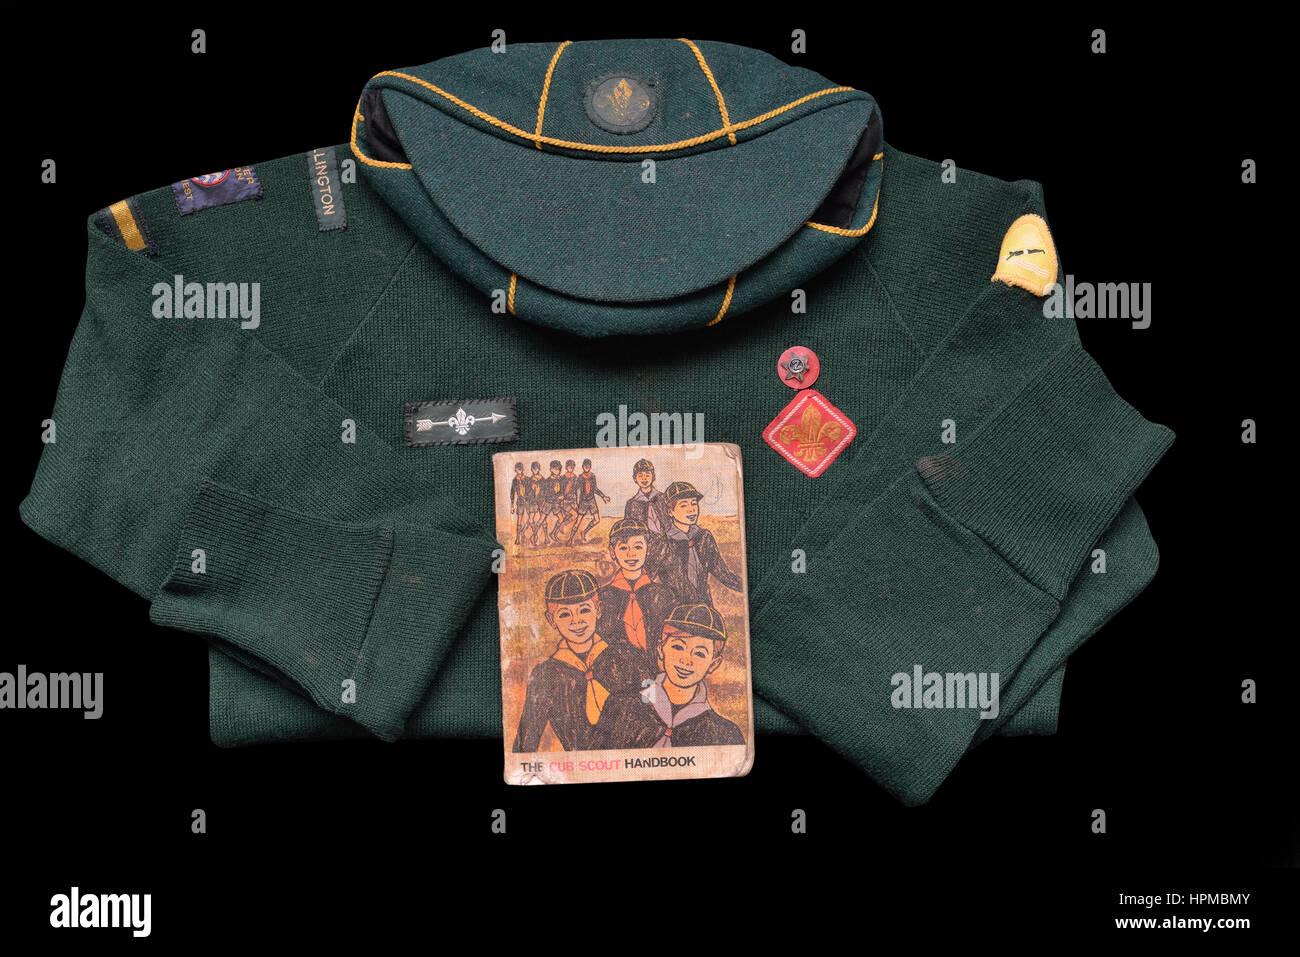 UK Cub Scout handbook and uniform circa 1970's - Stock Image